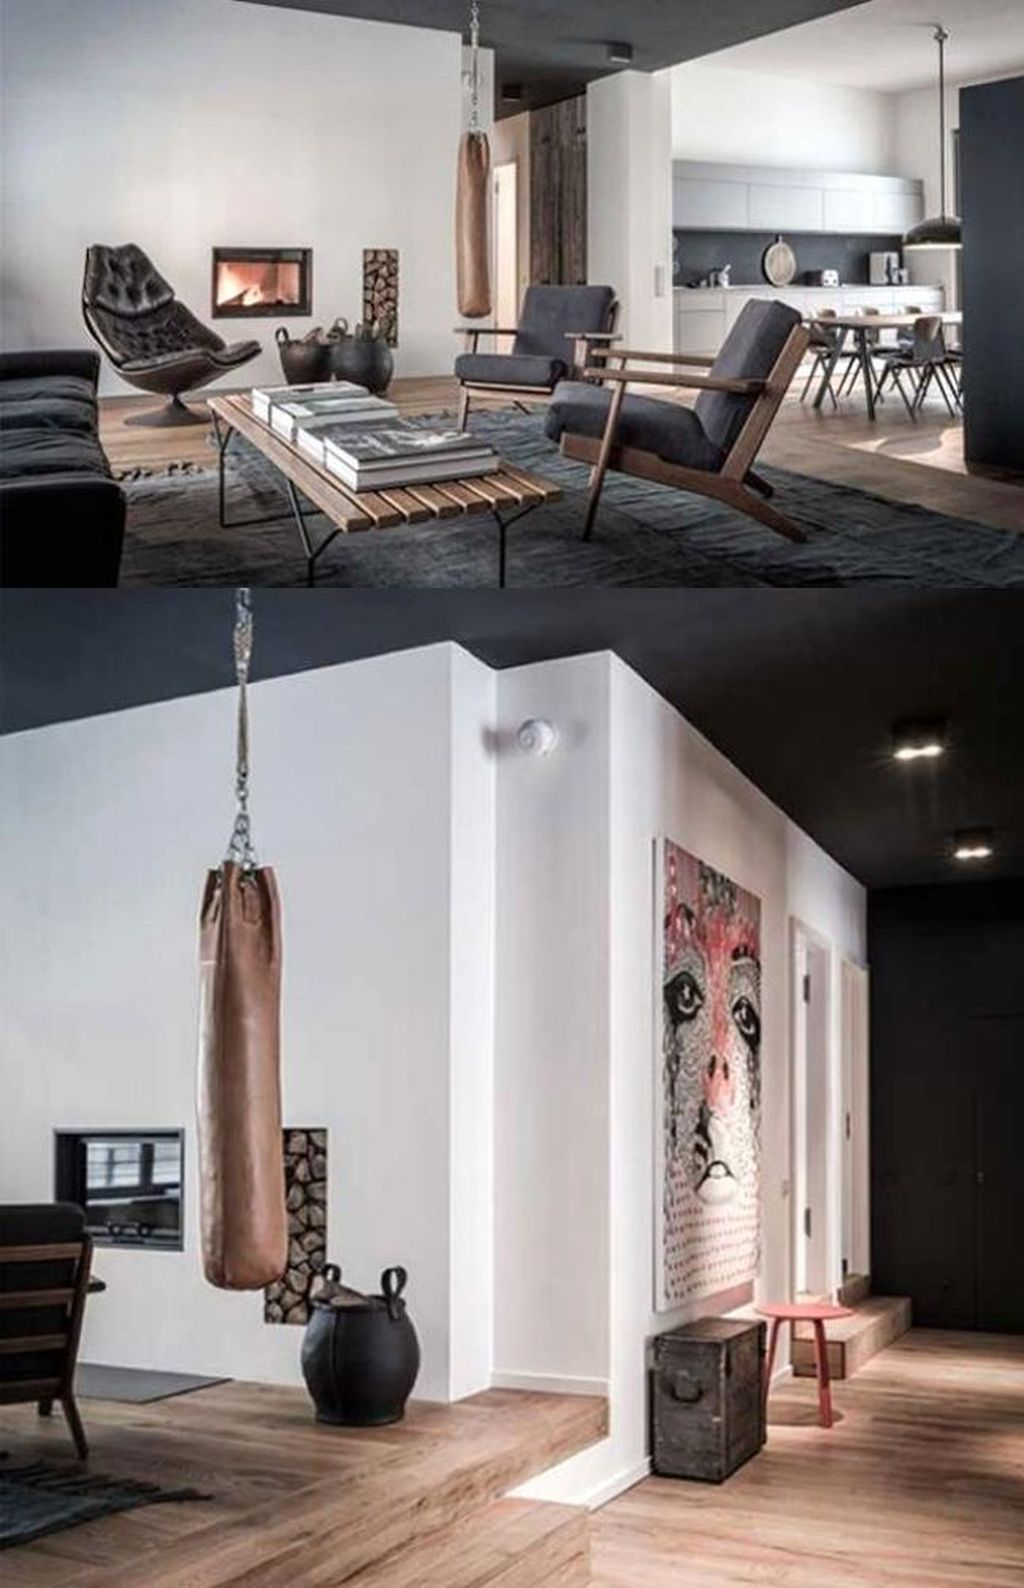 46 Masculine Apartment Decorating Ideas